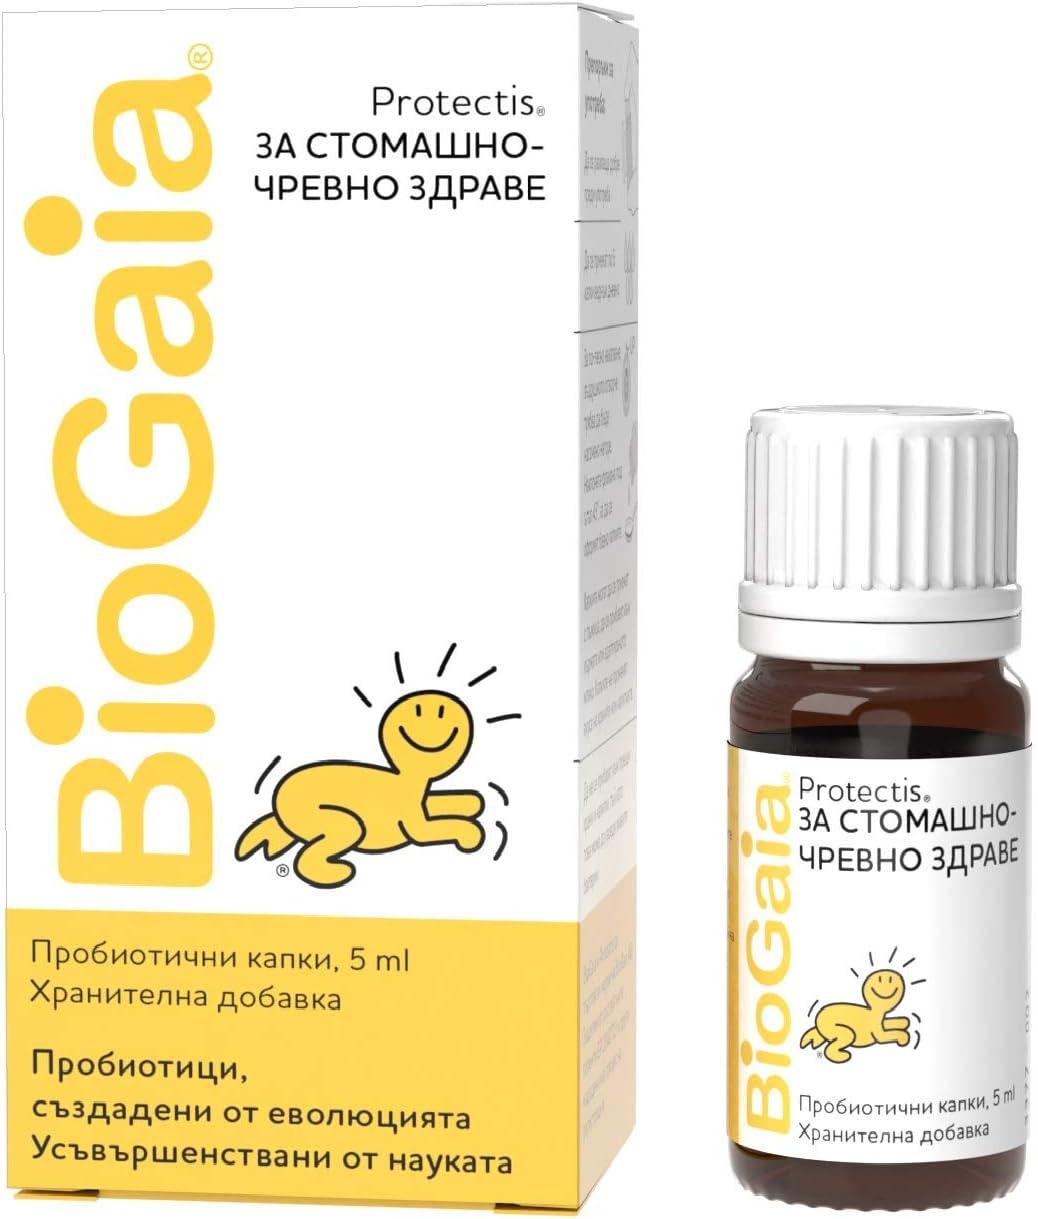 BioGaia Lactobacillus Reuteri ProTectis Drops 5ml by PediAct